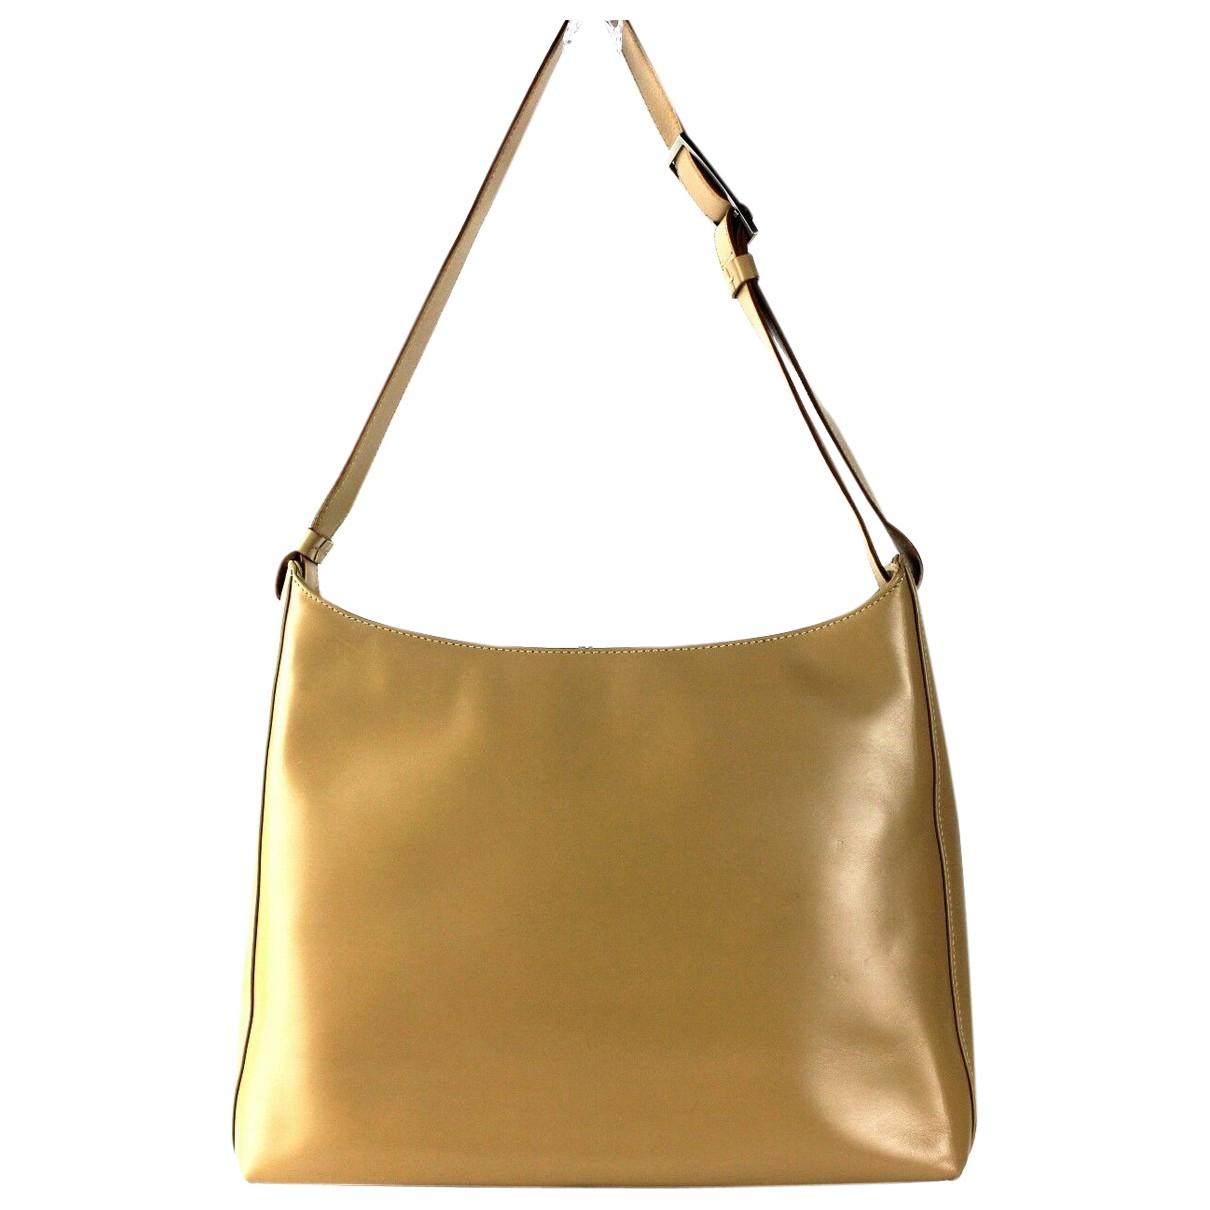 Salvatore Ferragamo \N Leather handbag for Women \N